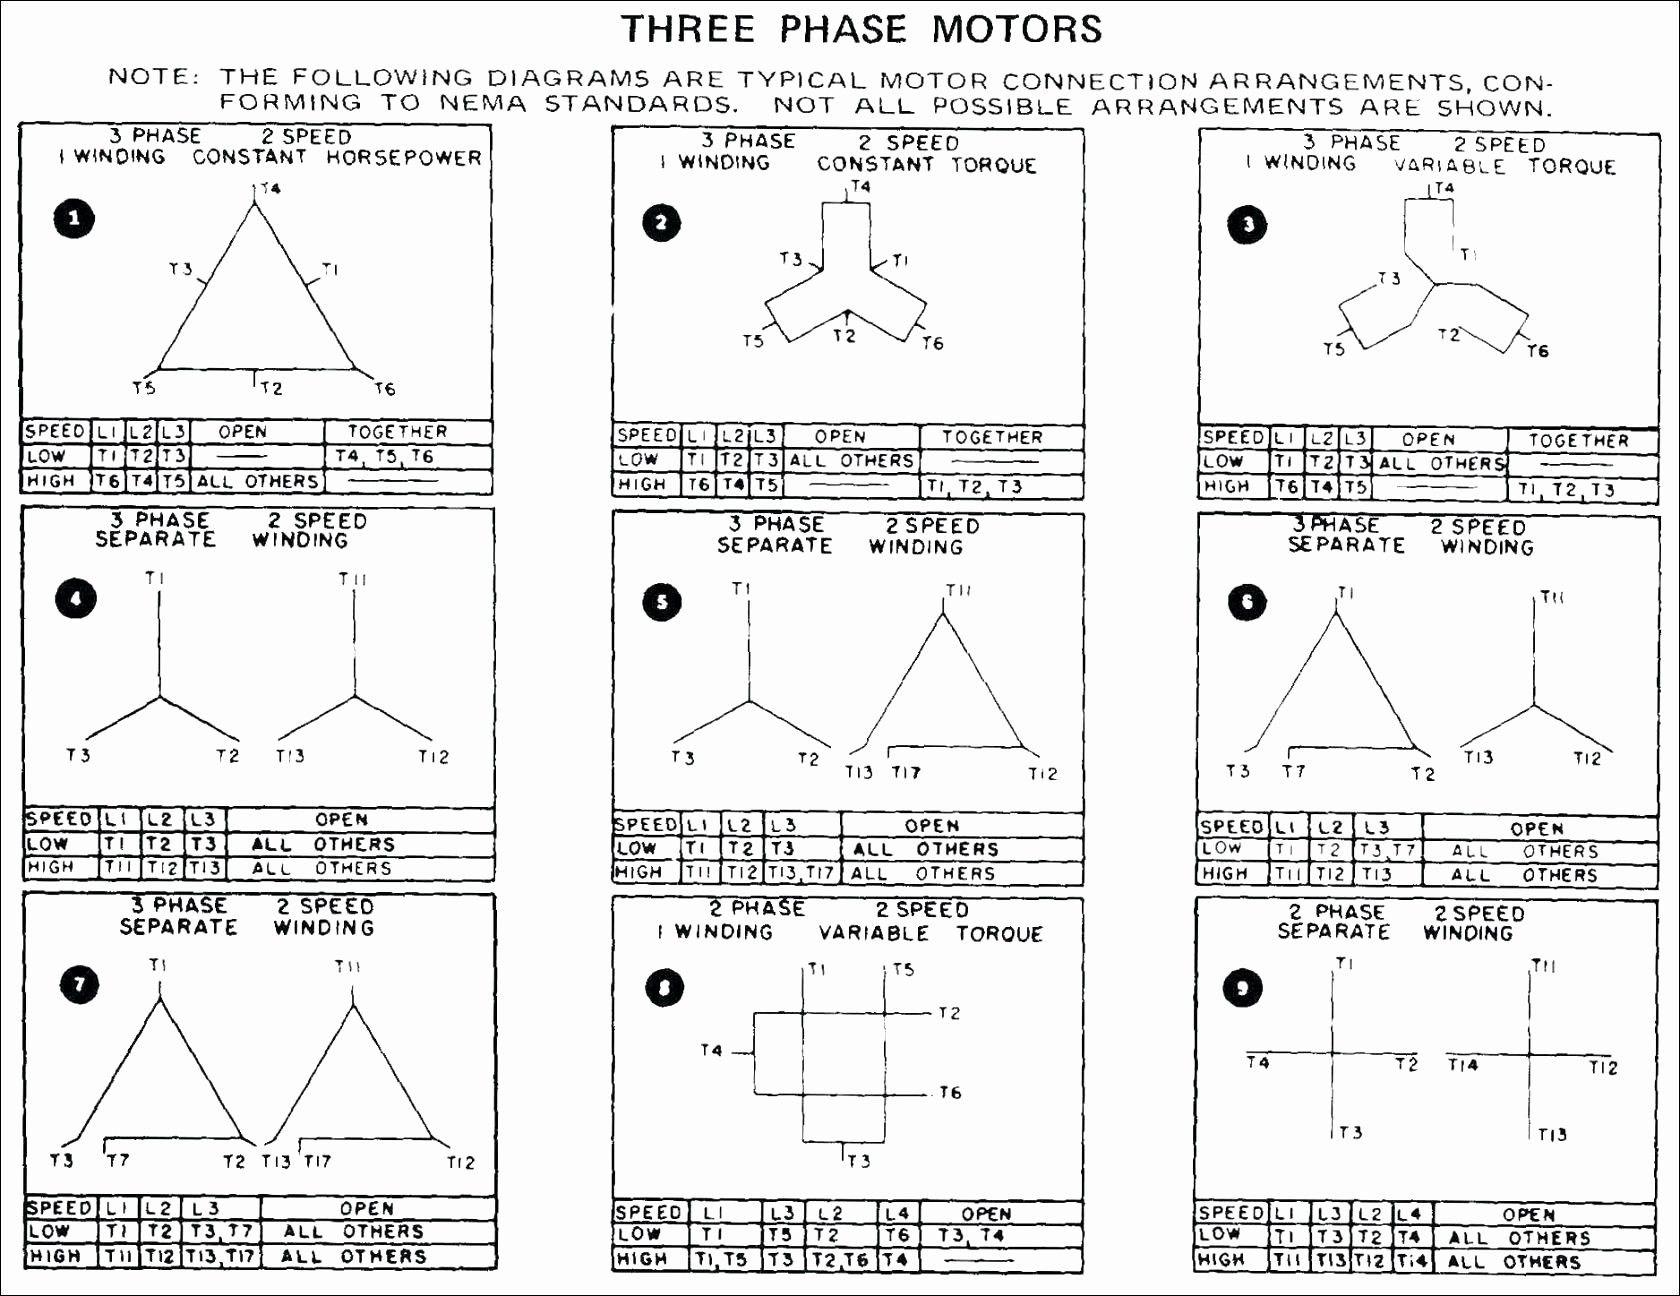 New Wiring Diagram Three Phase Generator Diagram Diagramsample Diagramtemplate Wiringdiagram Diagramchart Worksh Diagram Chart Diagram Worksheet Template